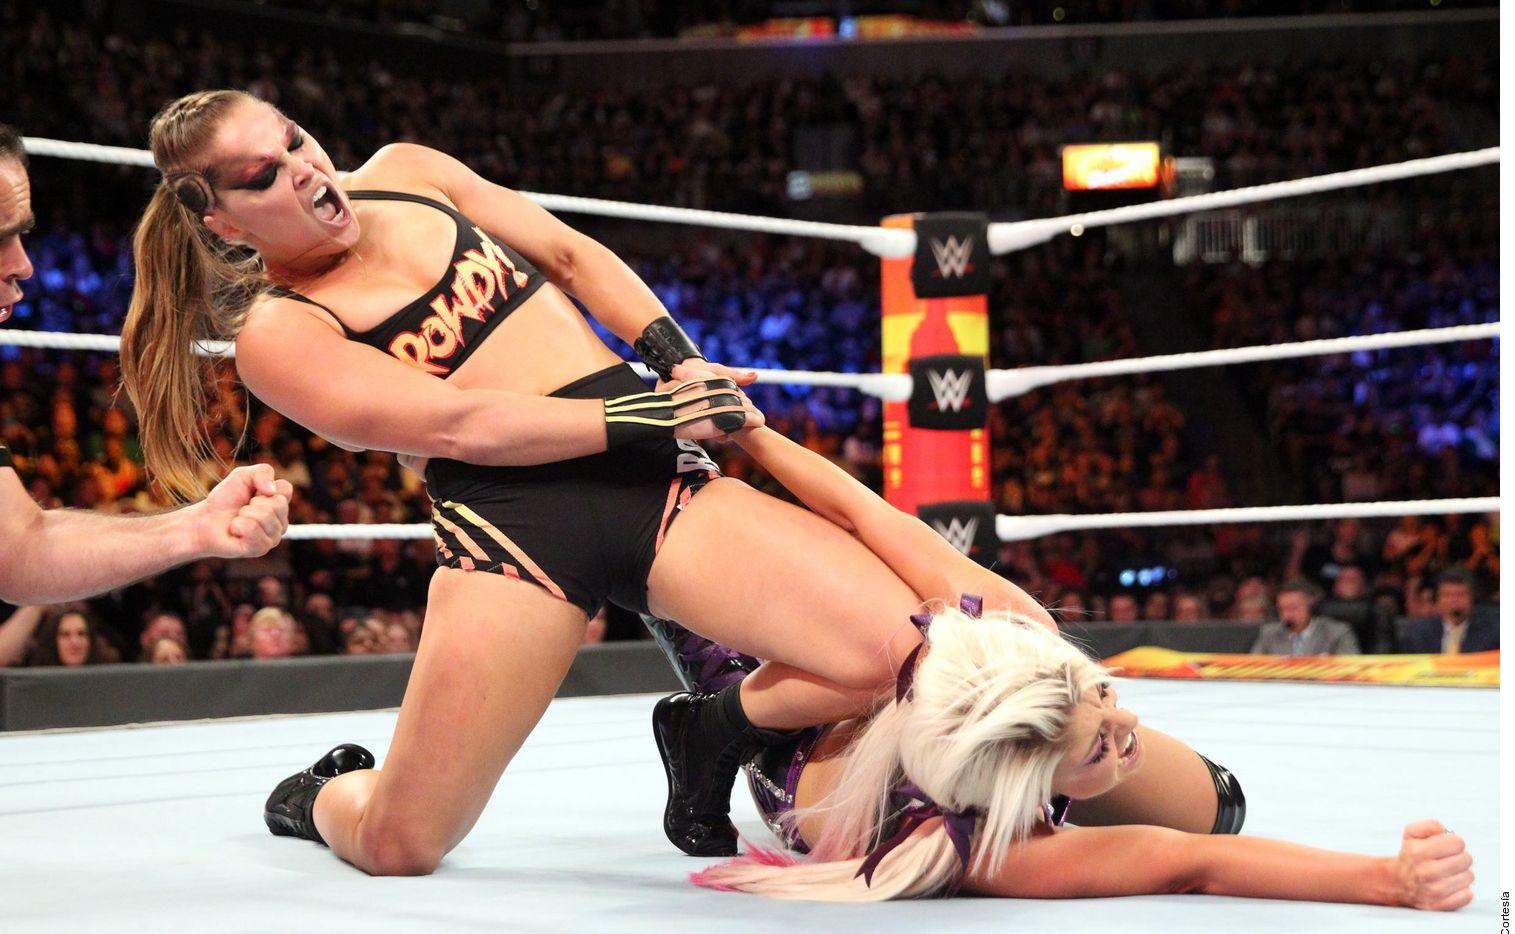 Un accidente casi deja sin un dedo a Ronda Rousey.